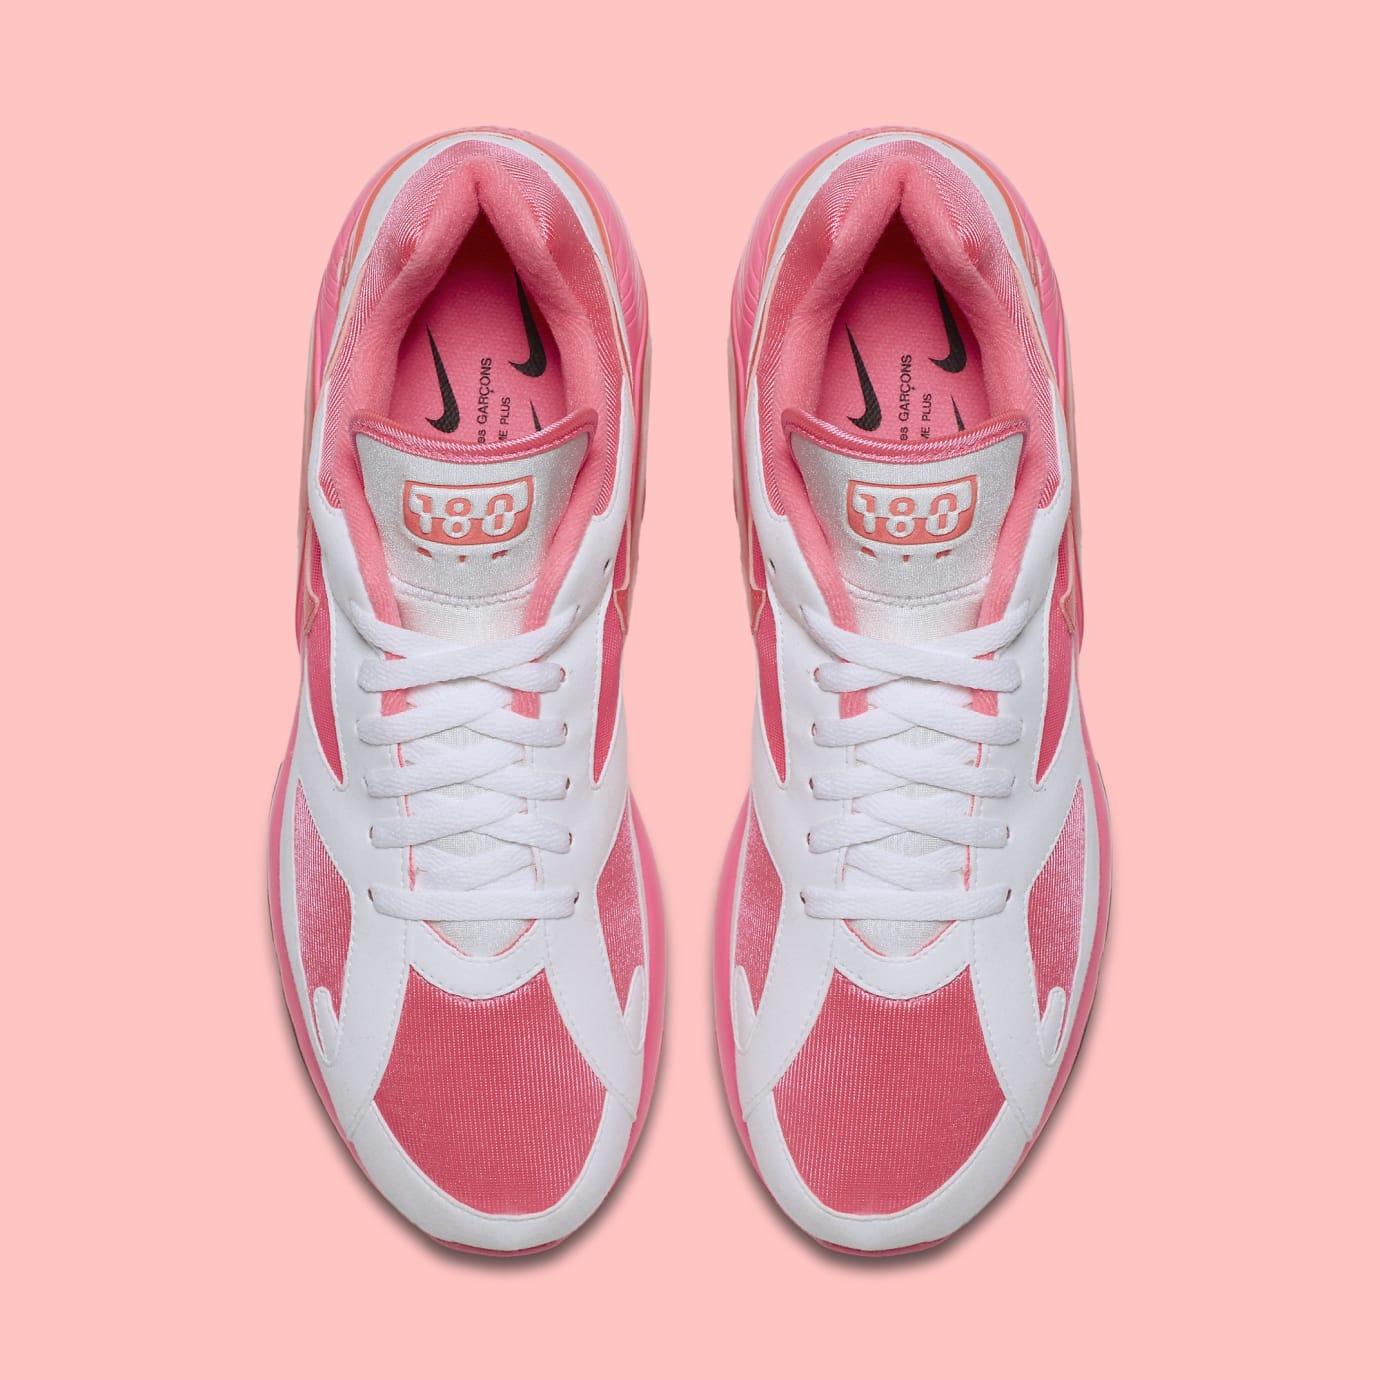 Comme des Garçons x Nike Air Max 180 'White' AO4641-600 (Top)